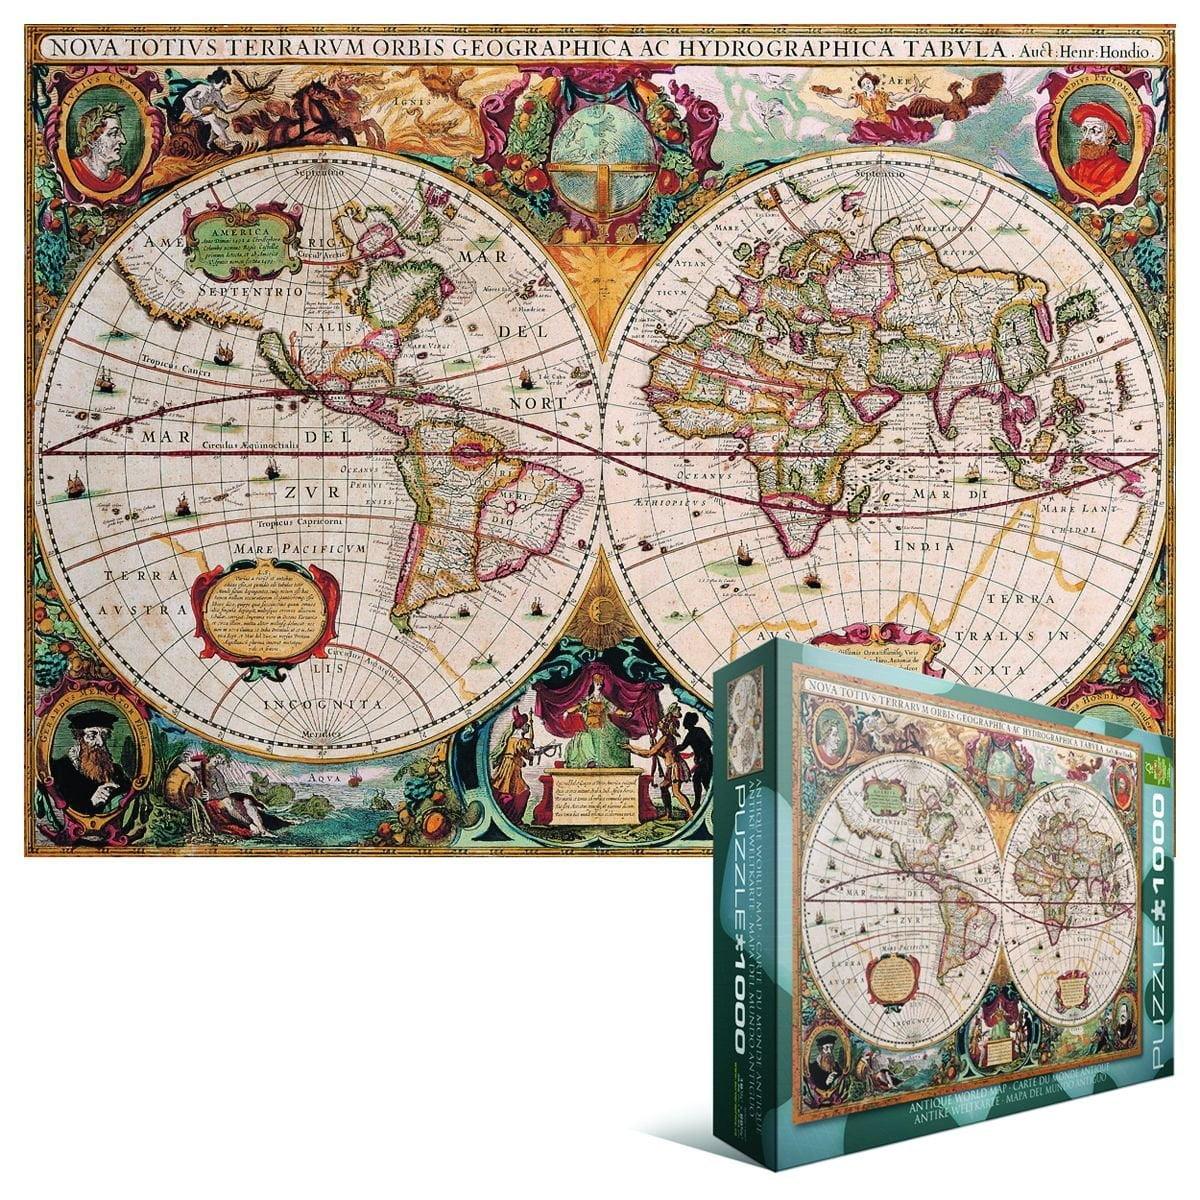 Eurographics antique world map 1000 piece jigsaw puzzle 60001997 eurographics antique world map 1000 piece jigsaw puzzle gumiabroncs Images